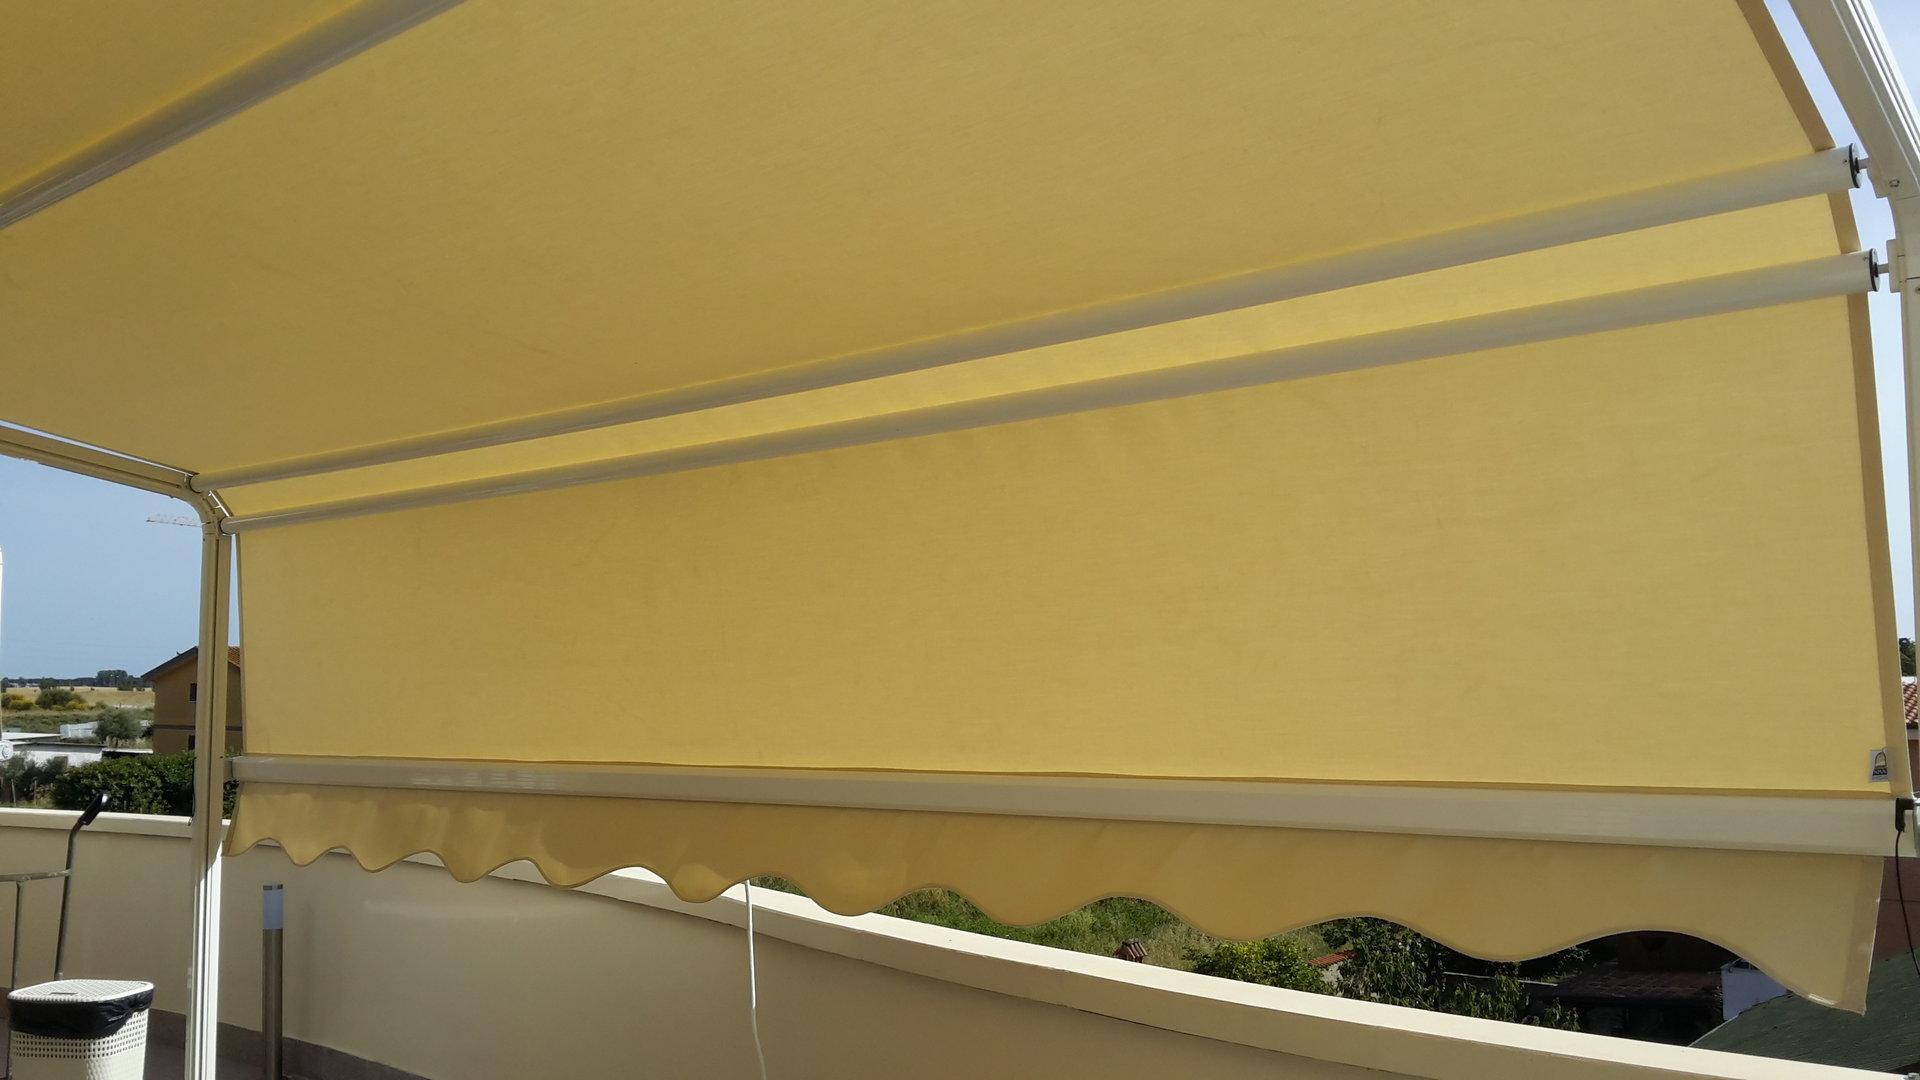 Awesome tende da sole per balconi with tende da sole per - Tende da sole per balconi ikea ...